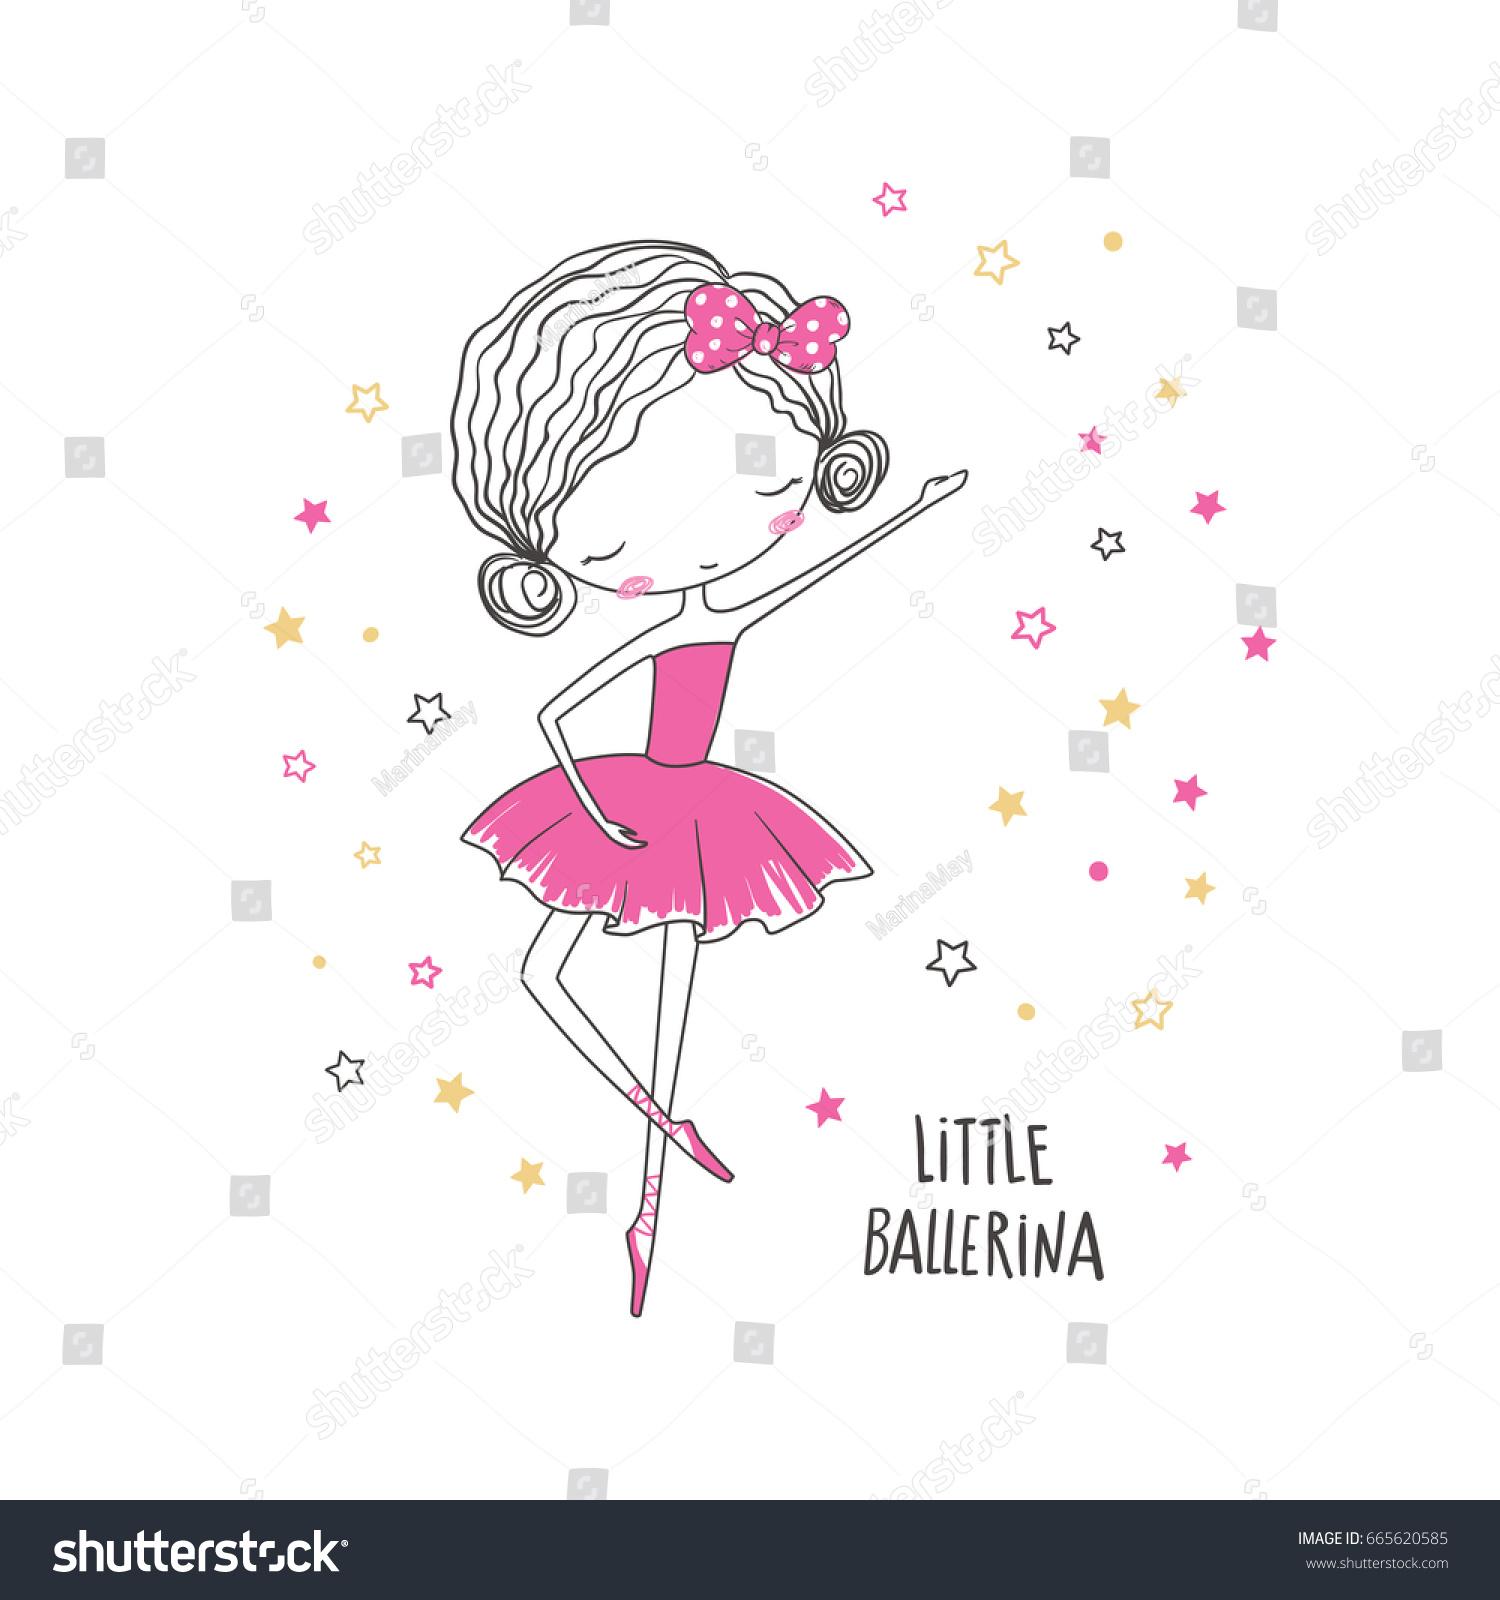 little ballerina tshirt graphic kids clothing stock vector